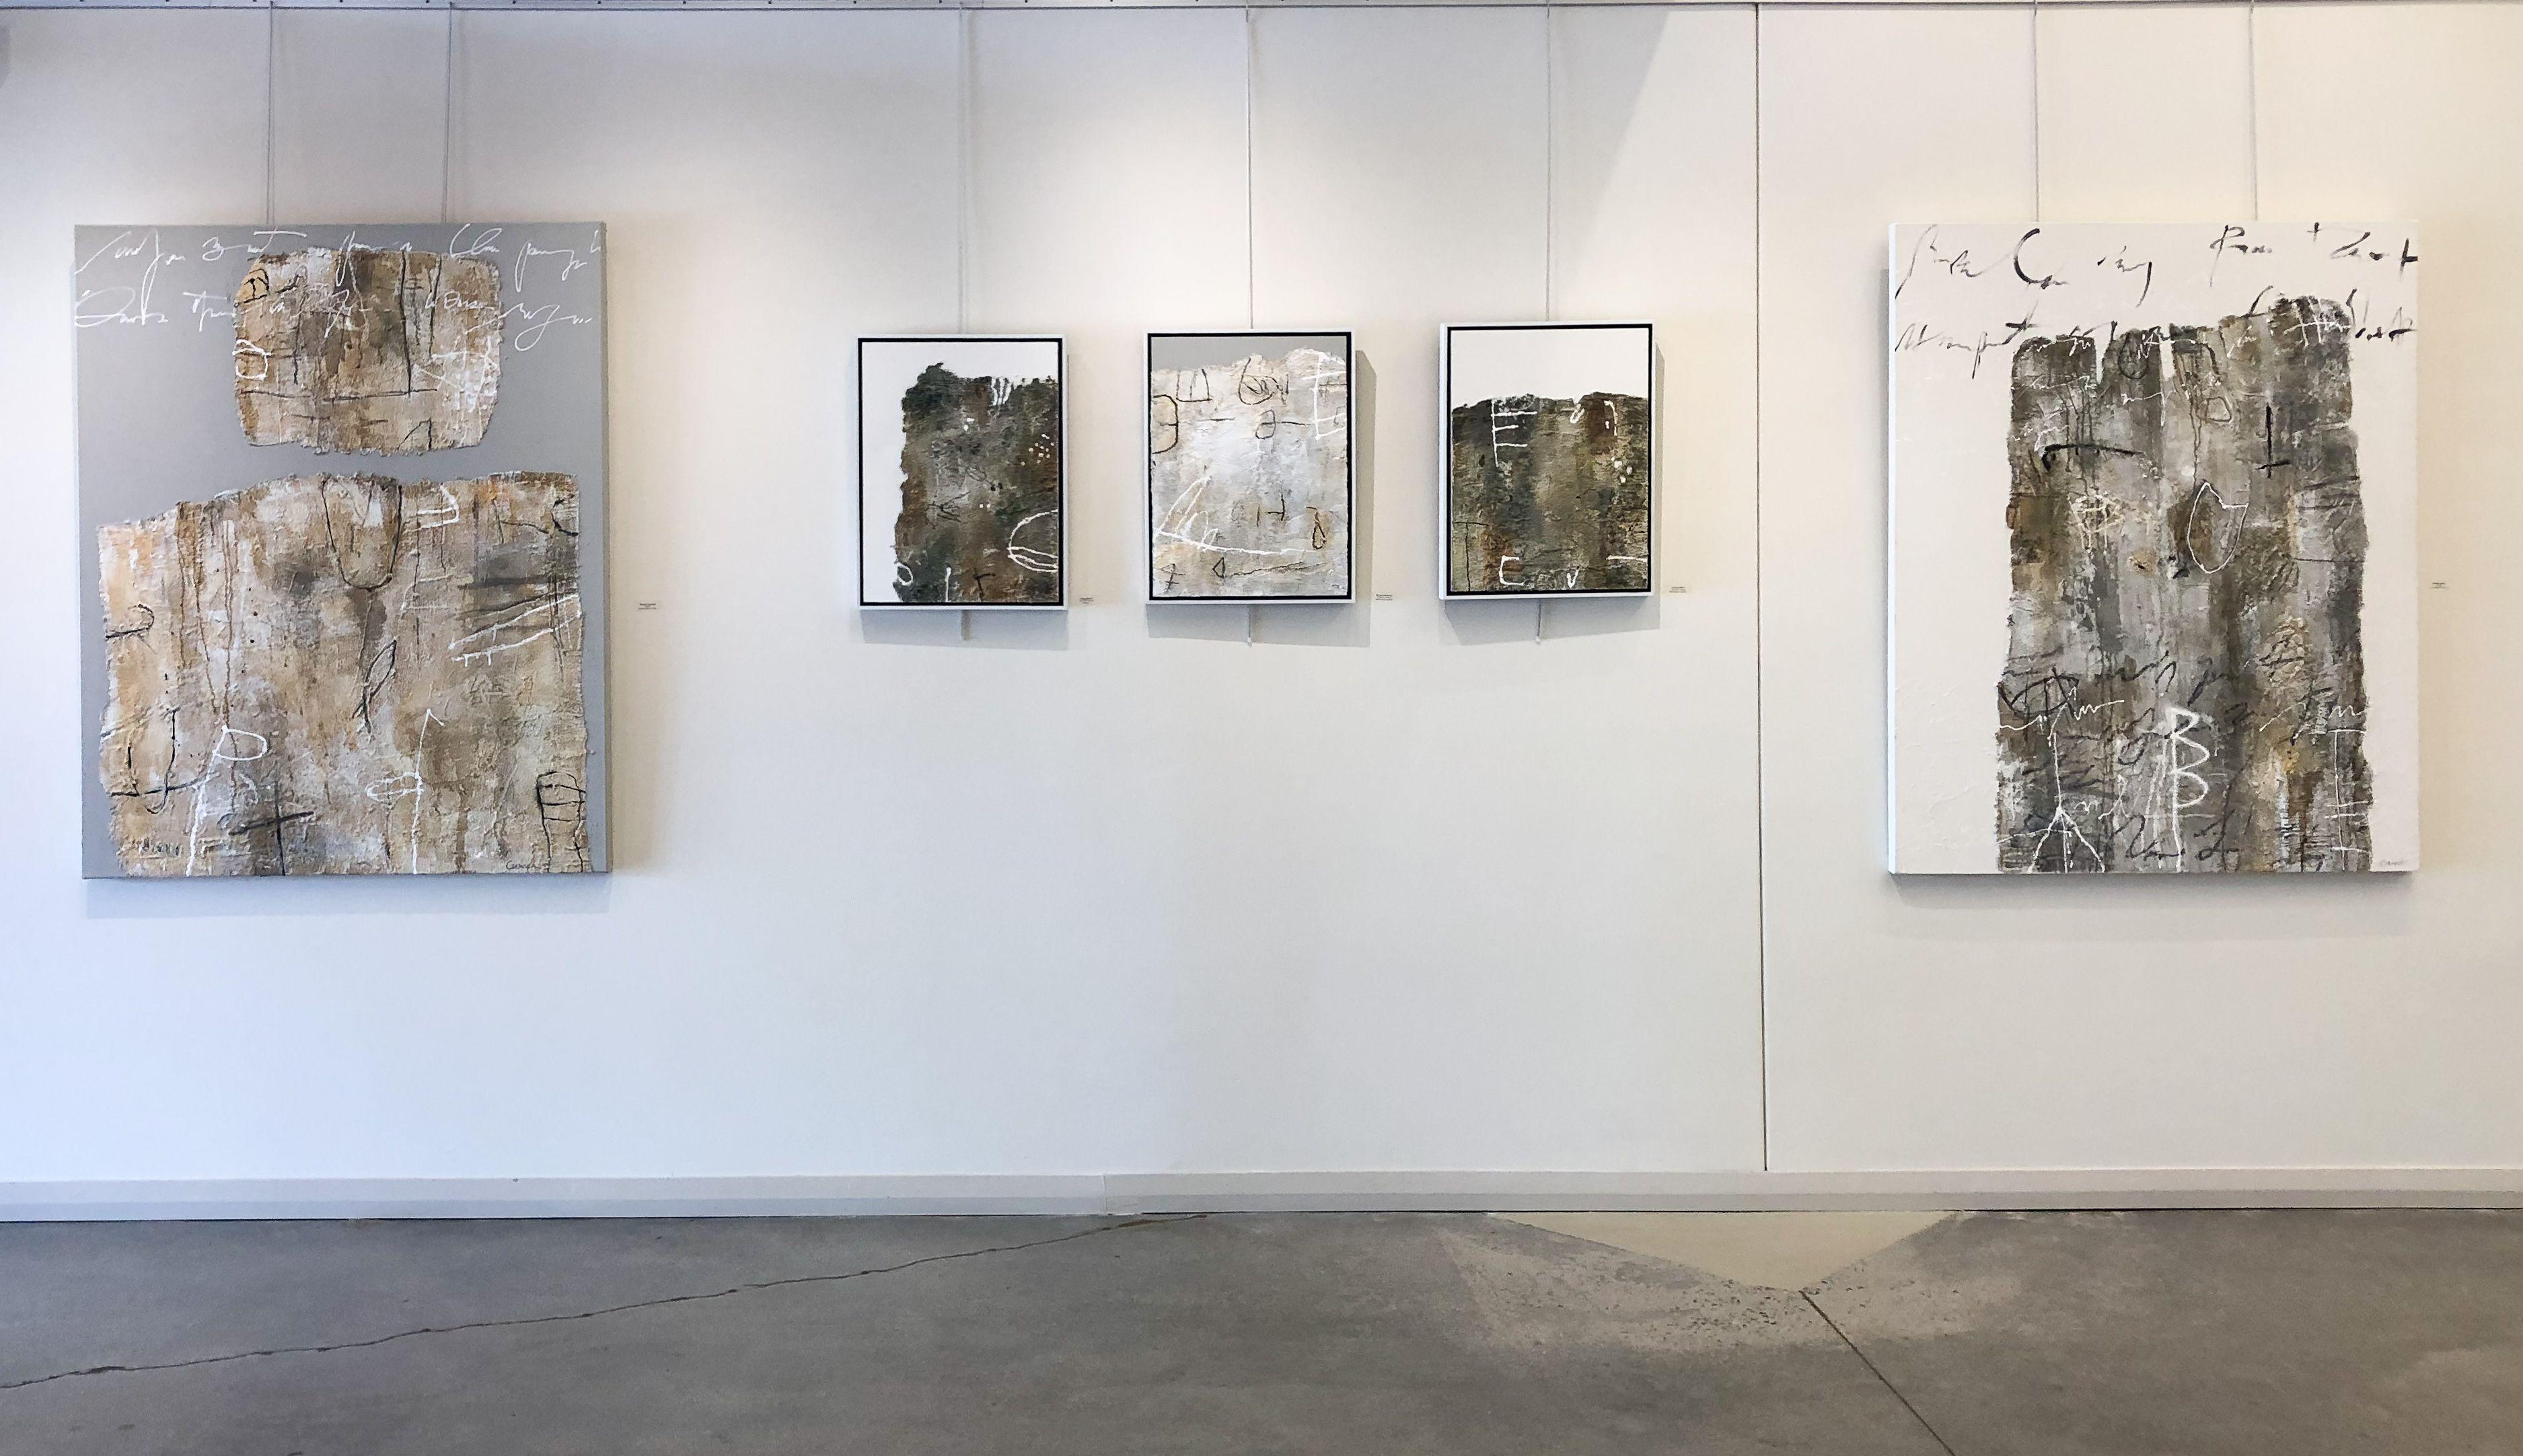 Installation shot of Carmack solo exhibition at Leland